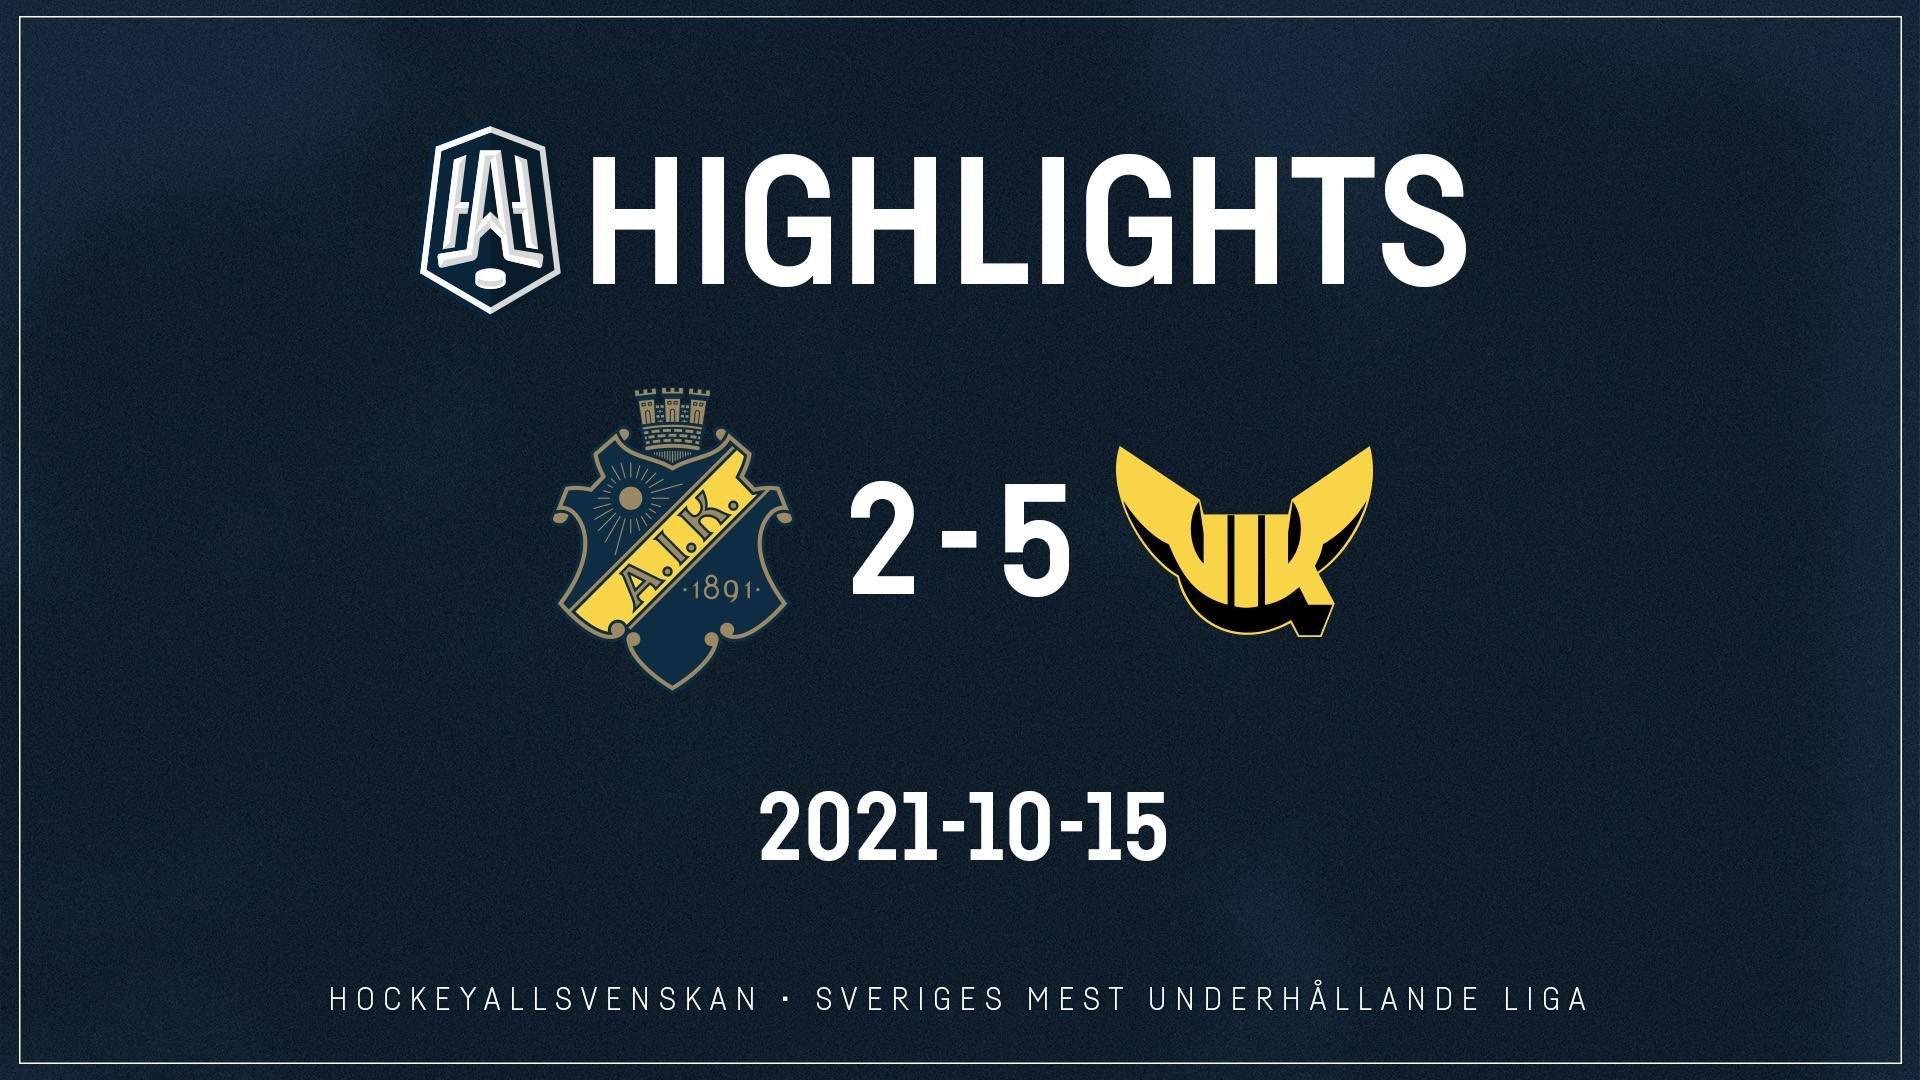 2021-10-15 AIK - Västerås 2-5